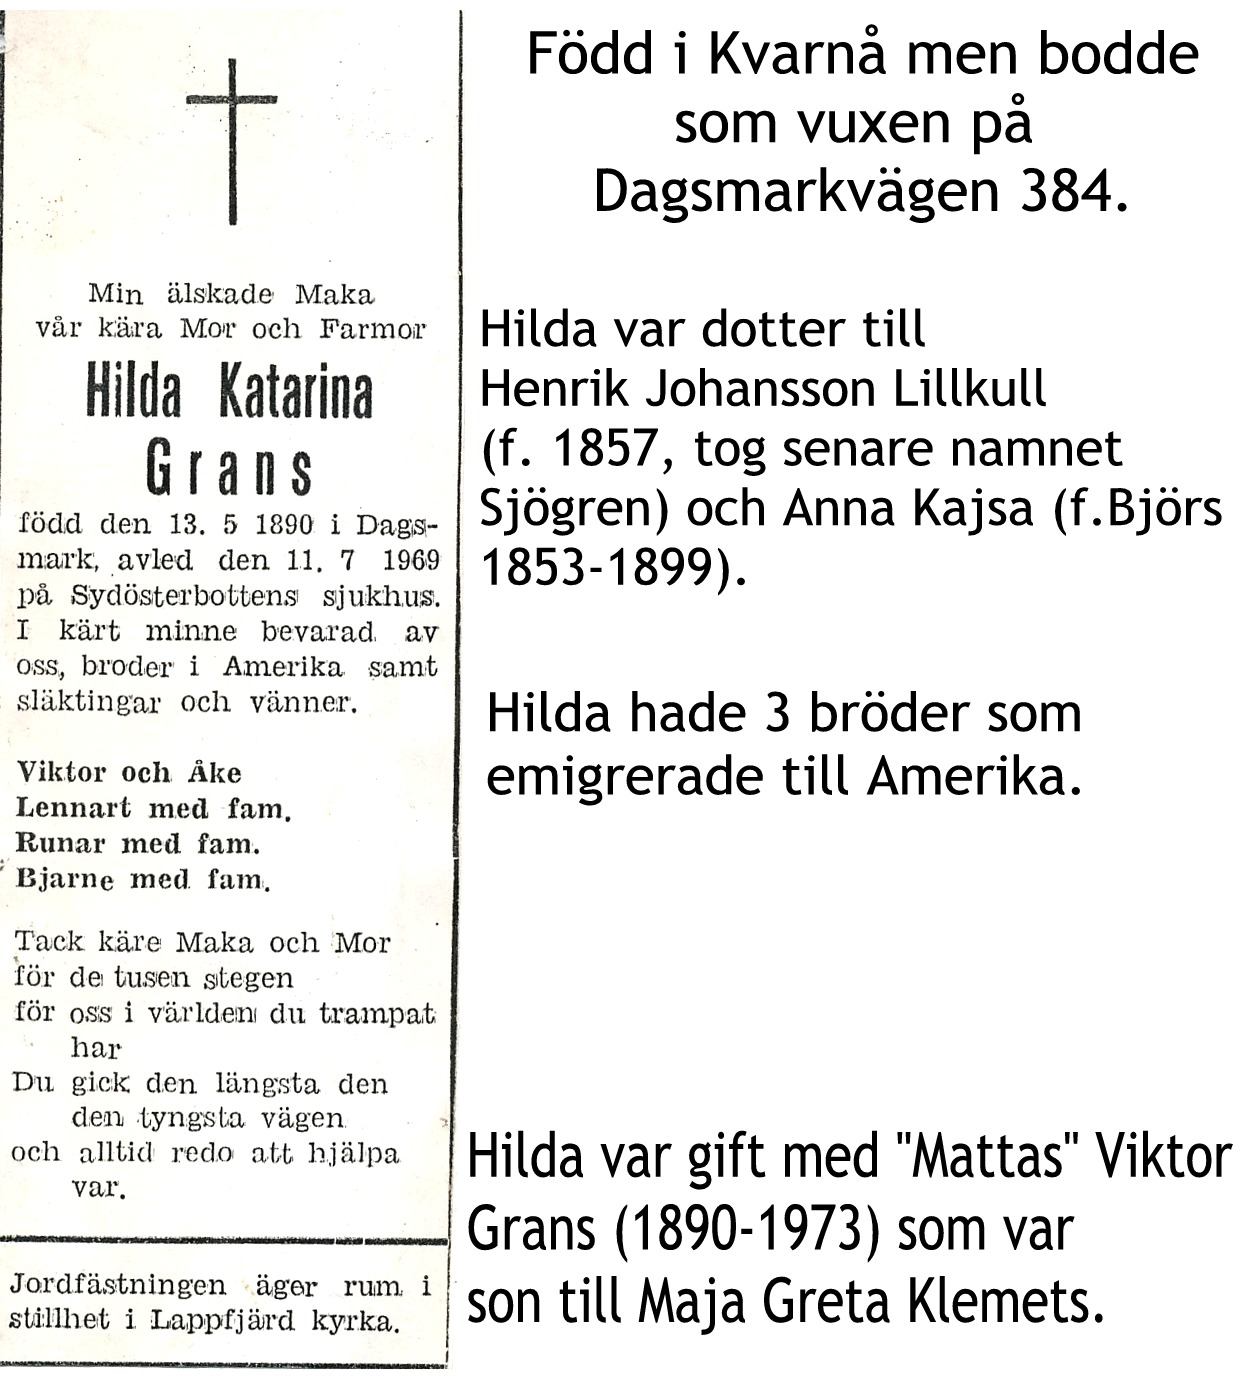 Grans Hilda Katarina